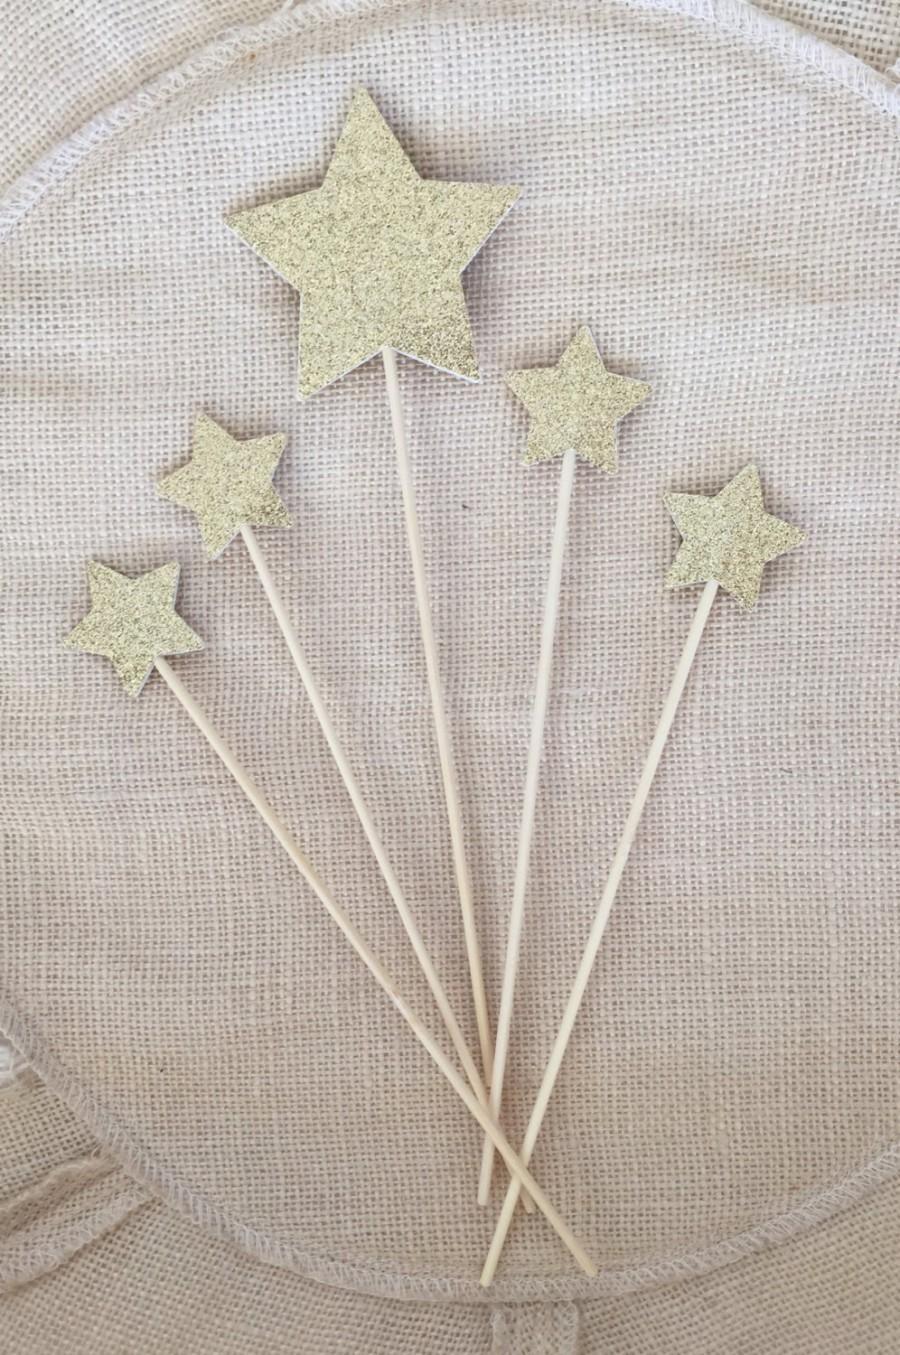 Свадьба - Gold Glitter Star Cake Topper Set (5),Twinkle Twinkle Little Star,Birthday,Baby Shower,Wedding,Star Topper,Party Decor,Gold Glitter Star